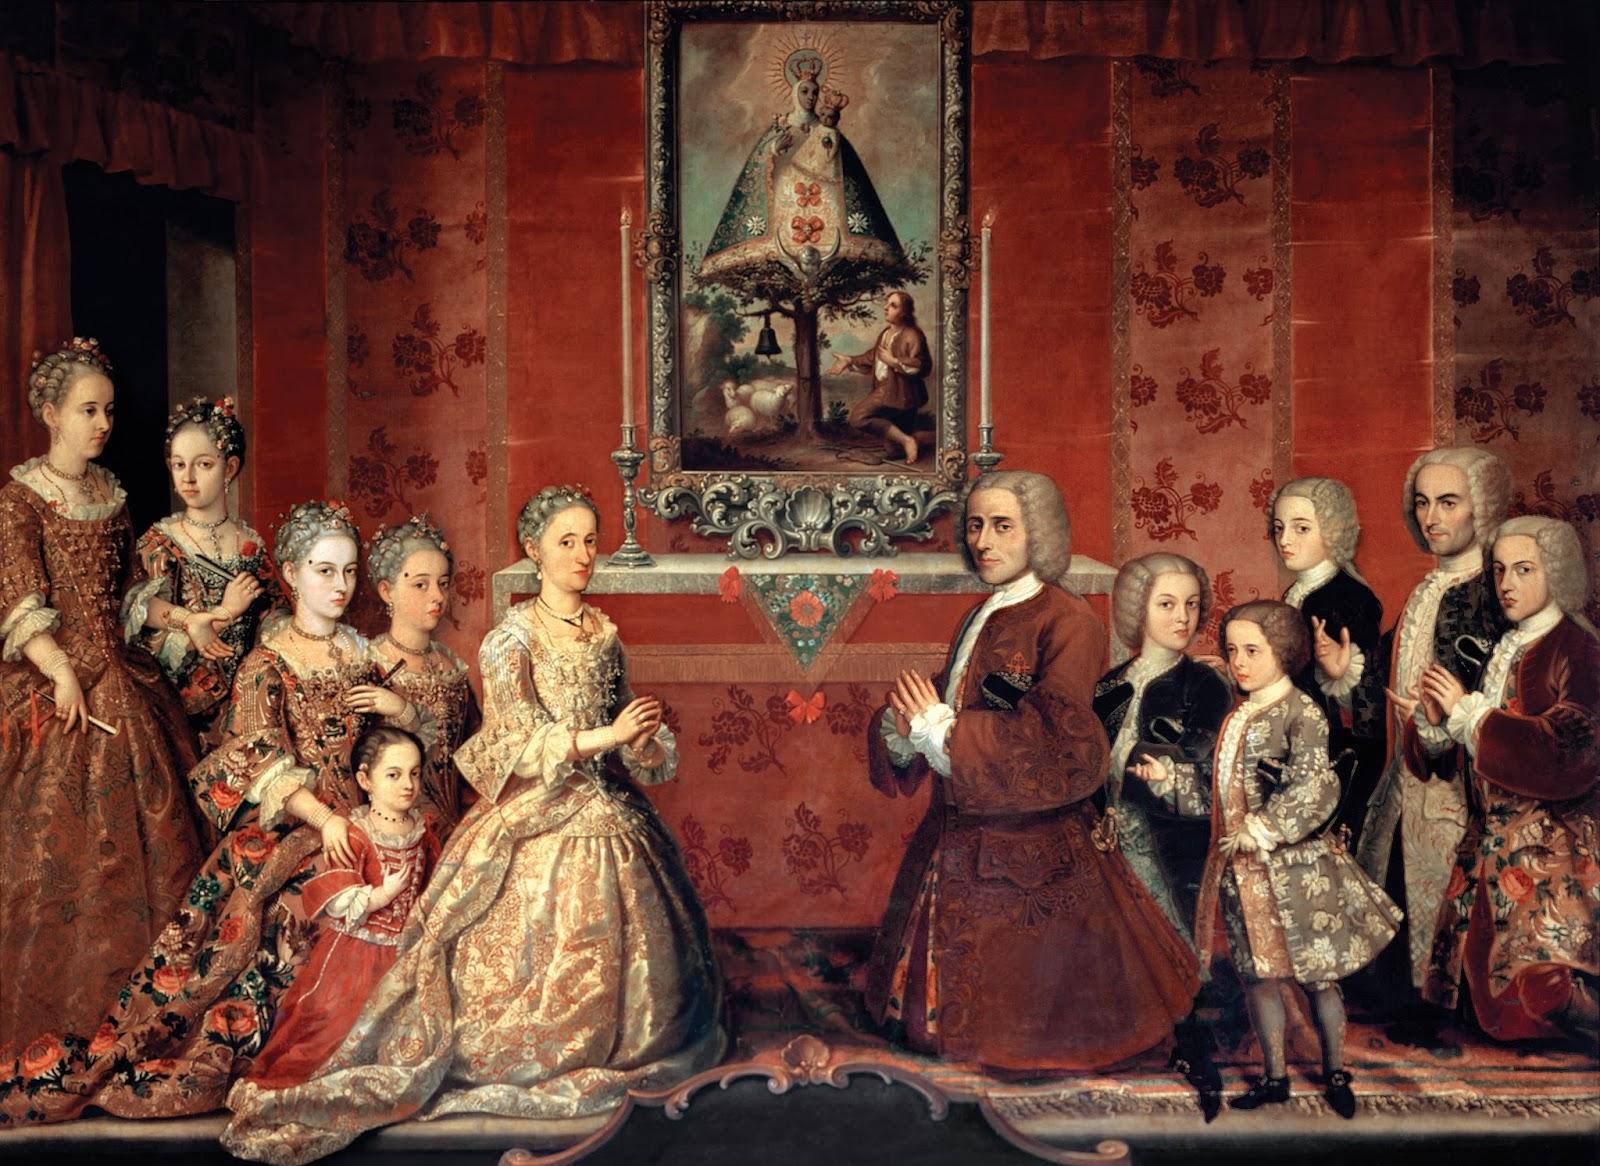 Retrato_de_familia_Fagoga_Arozqueta_-_Anónimo_ca.1730.jpg